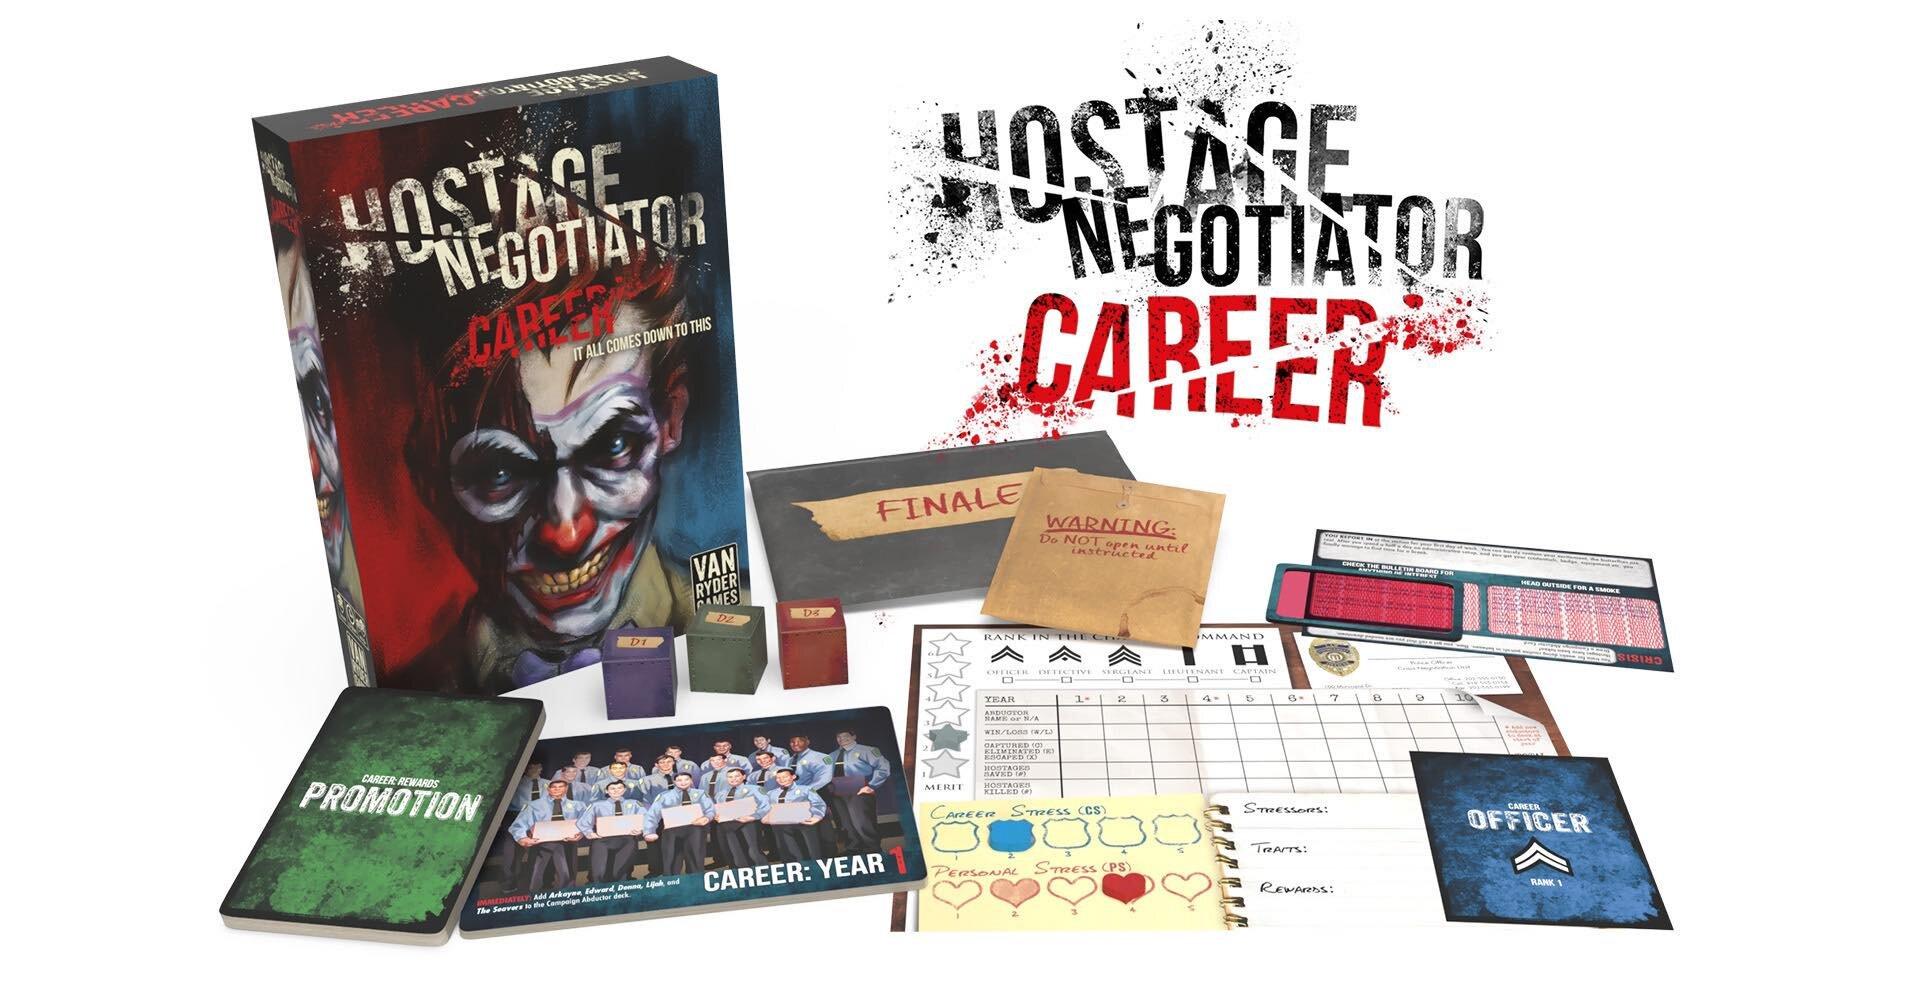 Hostage Negotiator: Career